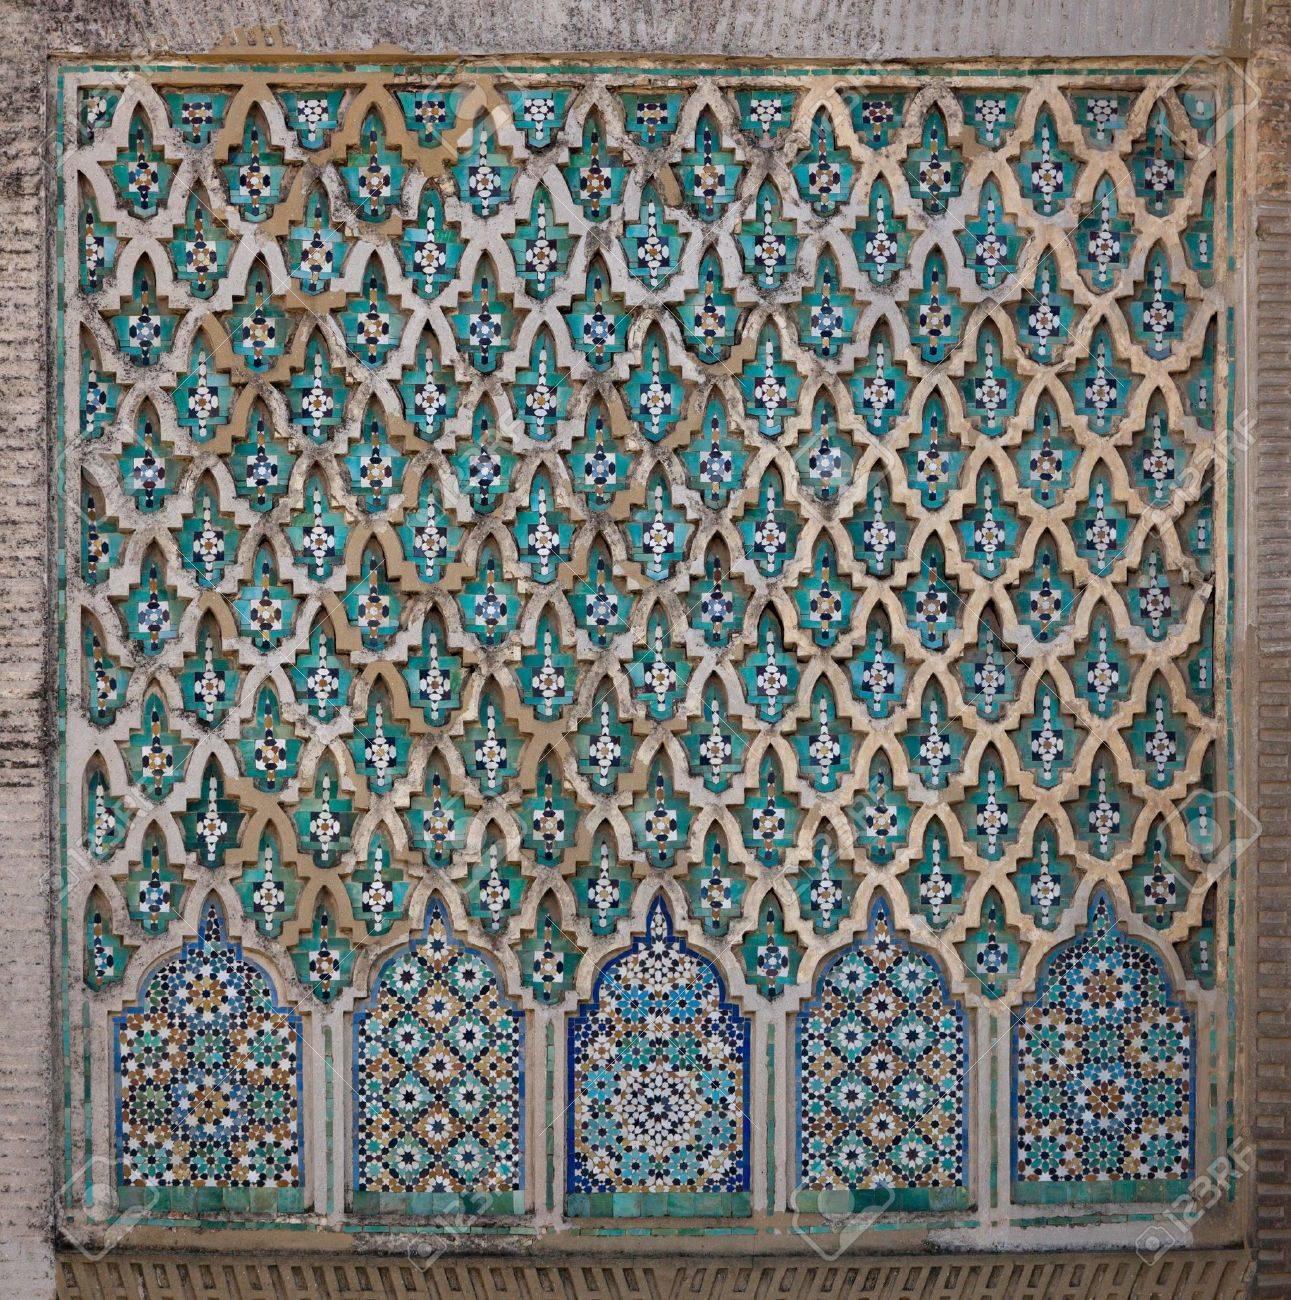 Bab Mansour El Alj Gate. Wall detail. Old city Meknes (Miknasa), Morocco. - 9228299